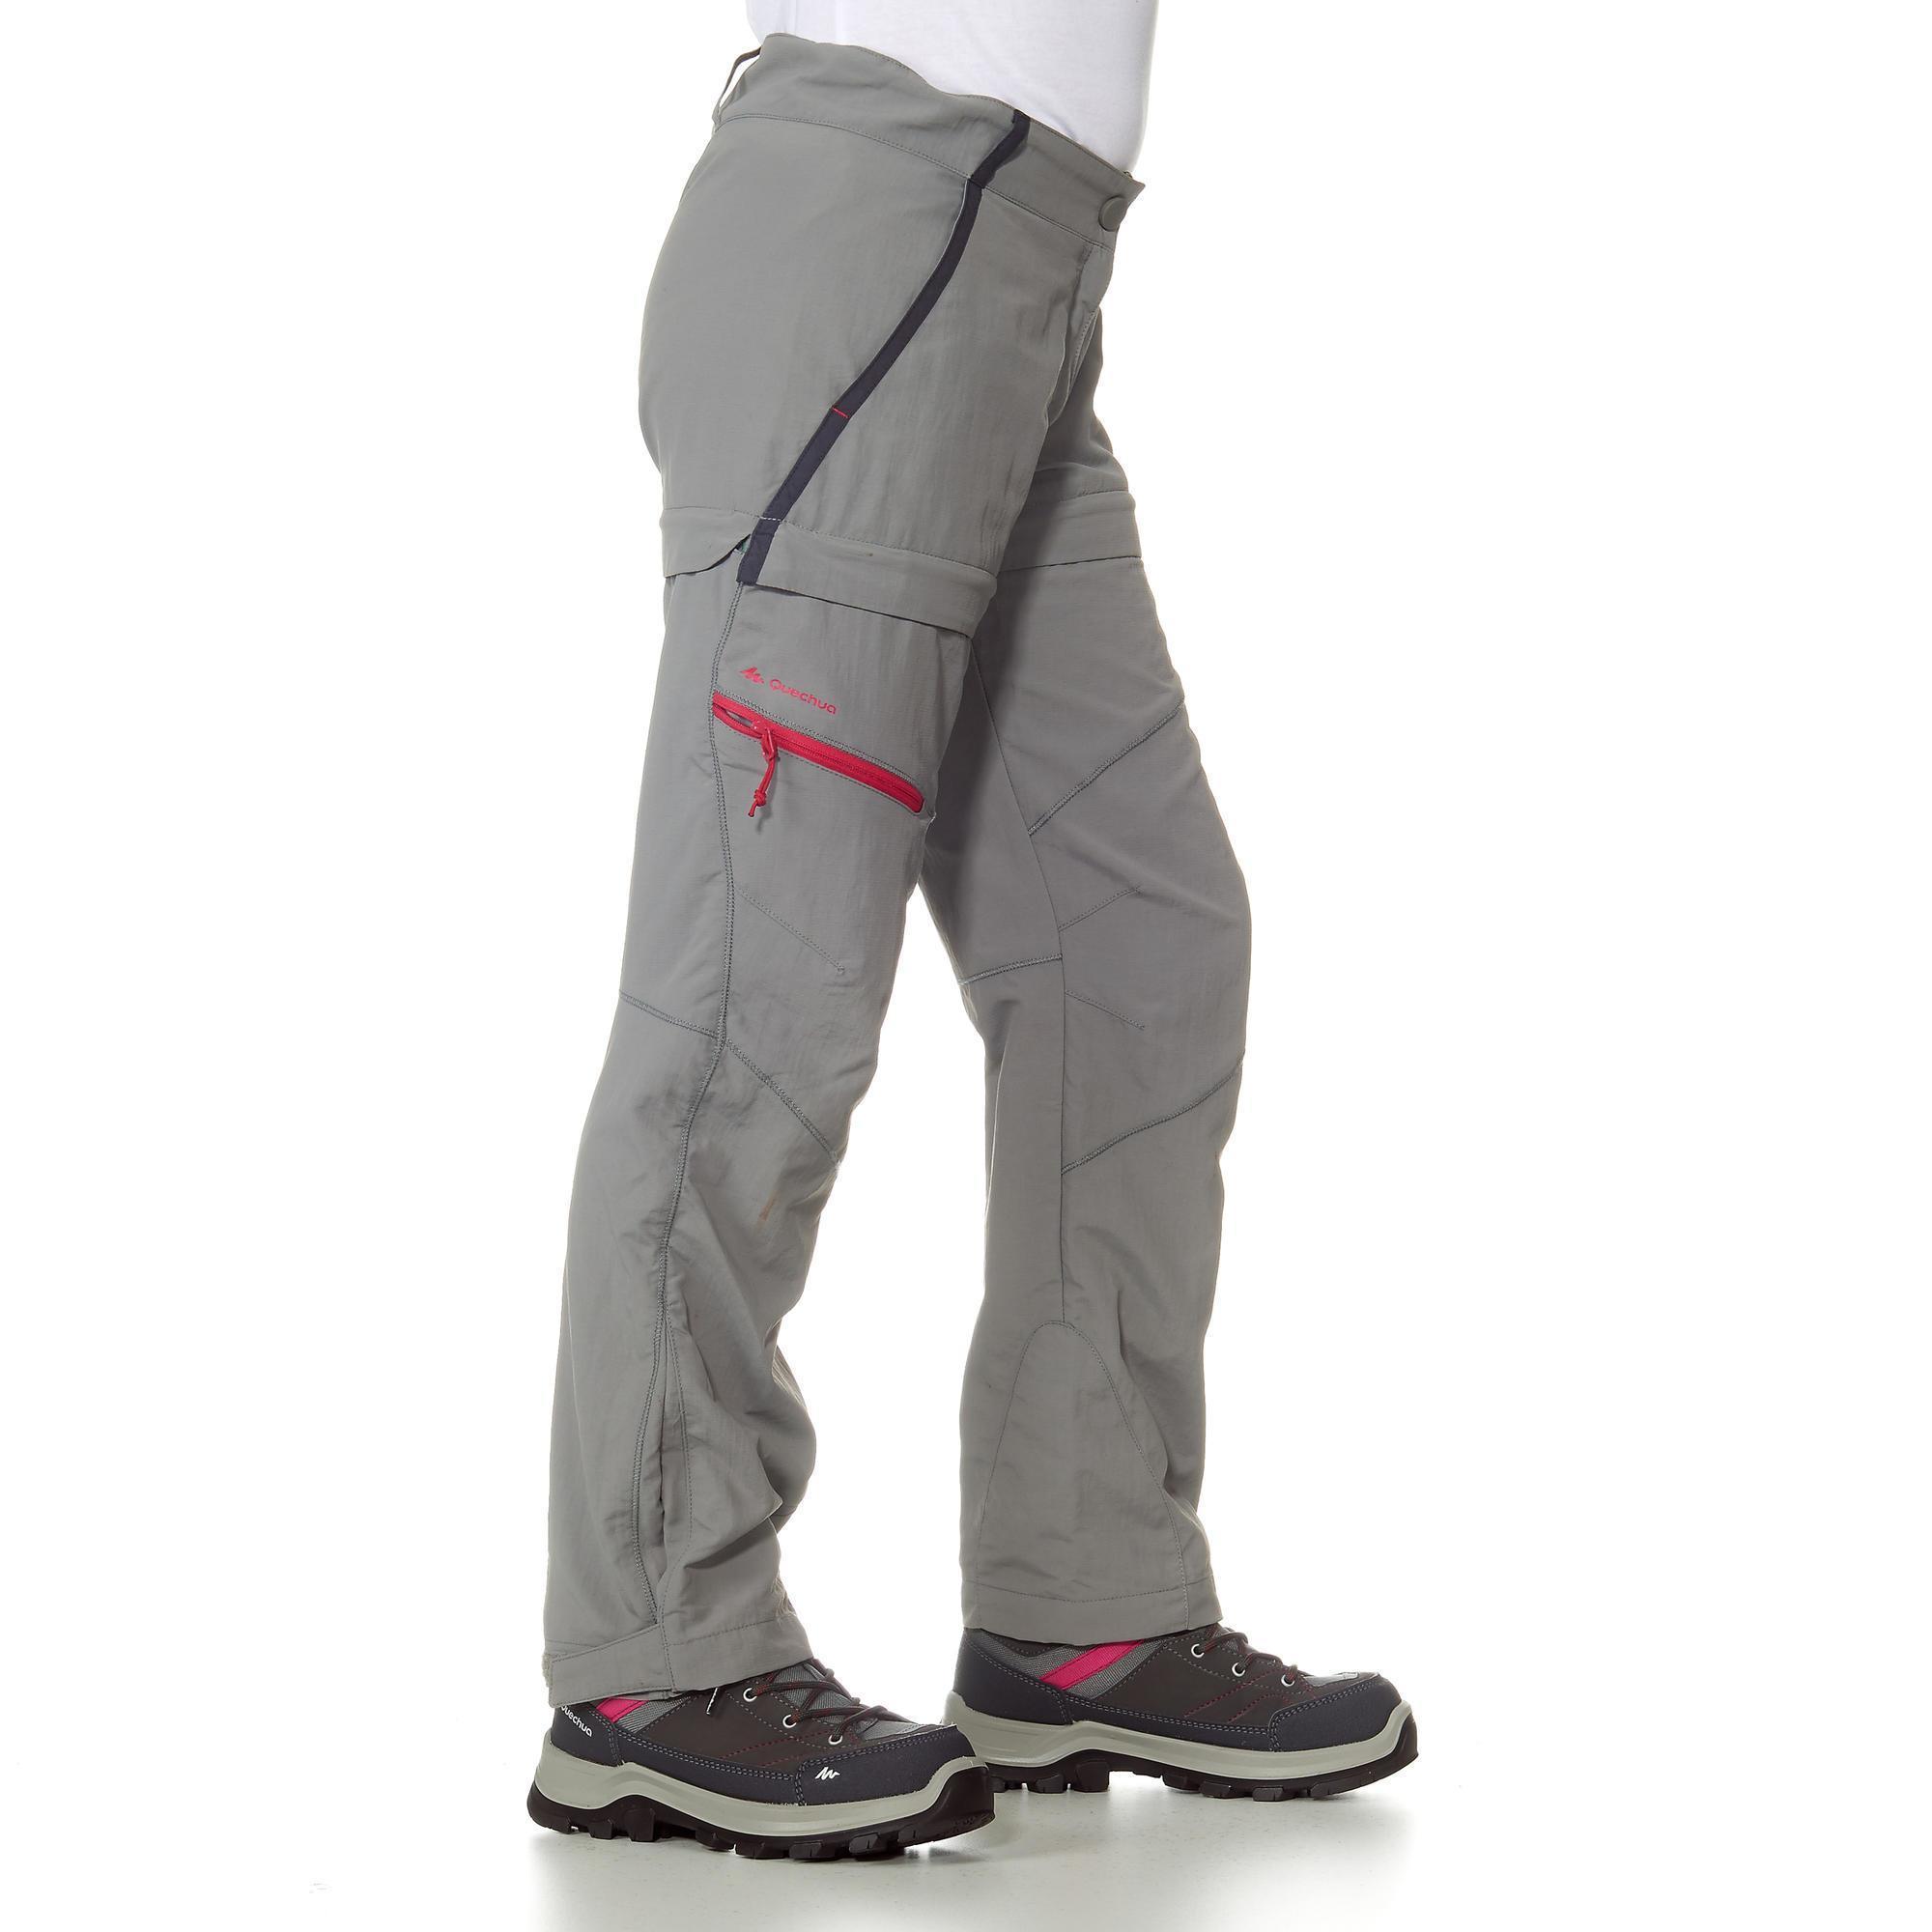 pantalon de randonn e modulable fille hike 900 gris quechua. Black Bedroom Furniture Sets. Home Design Ideas